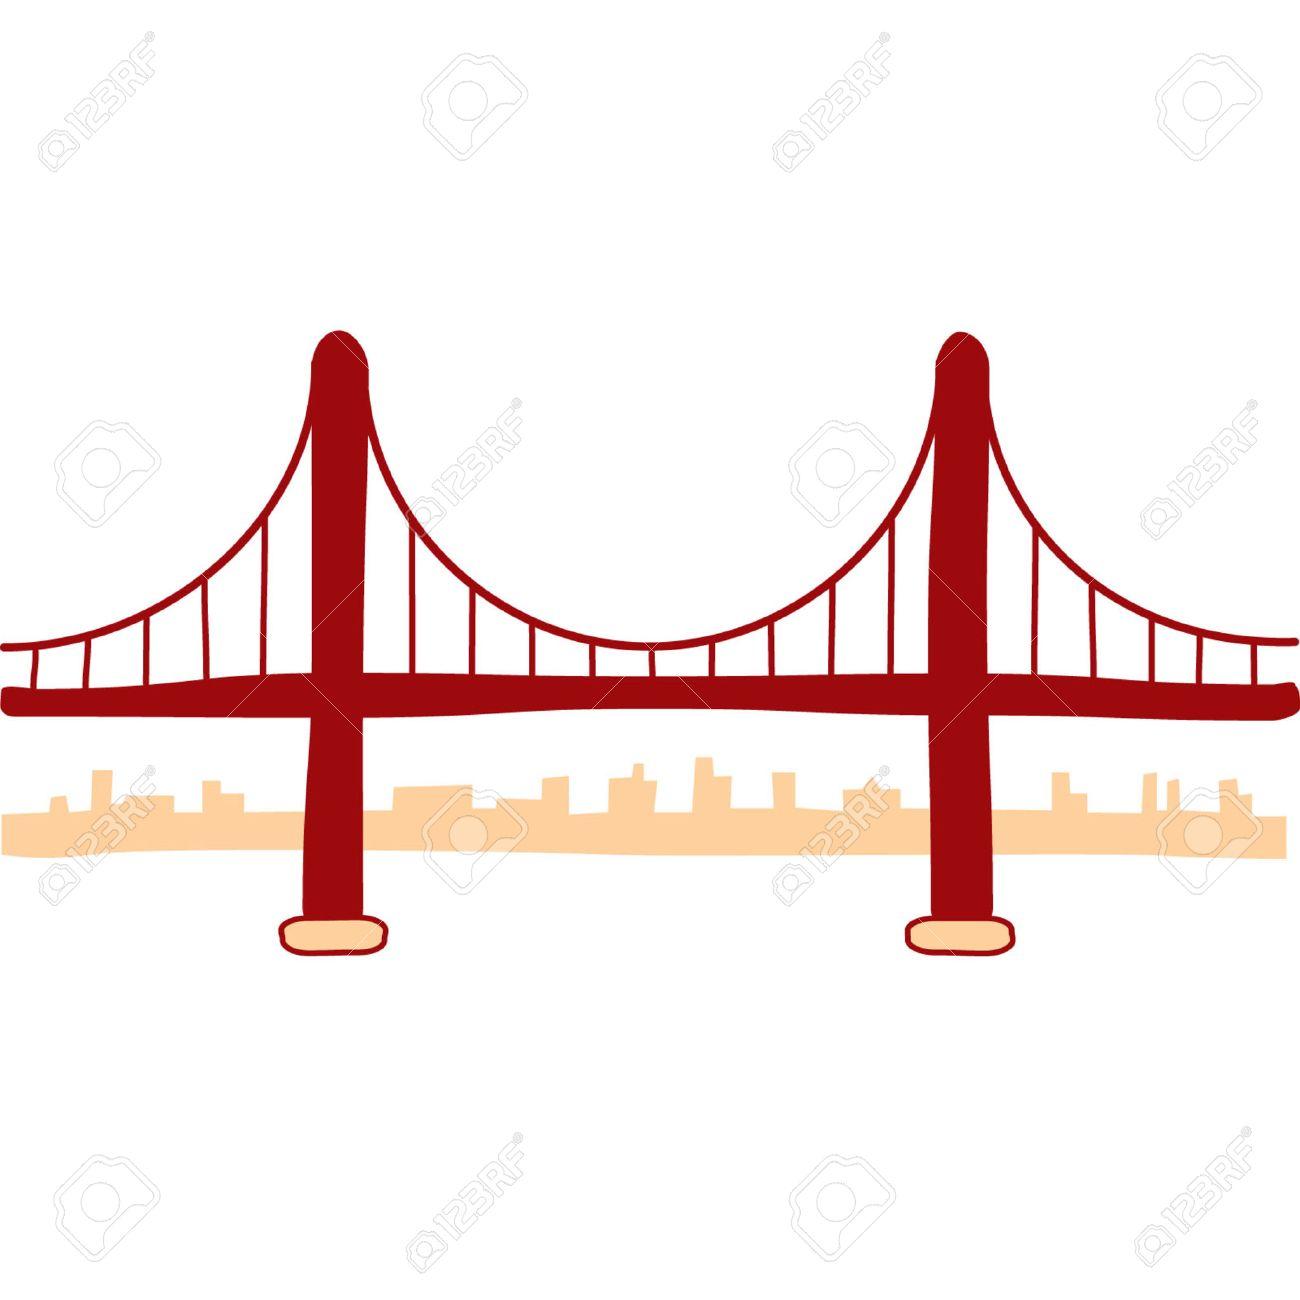 3454 Bridge free clipart.